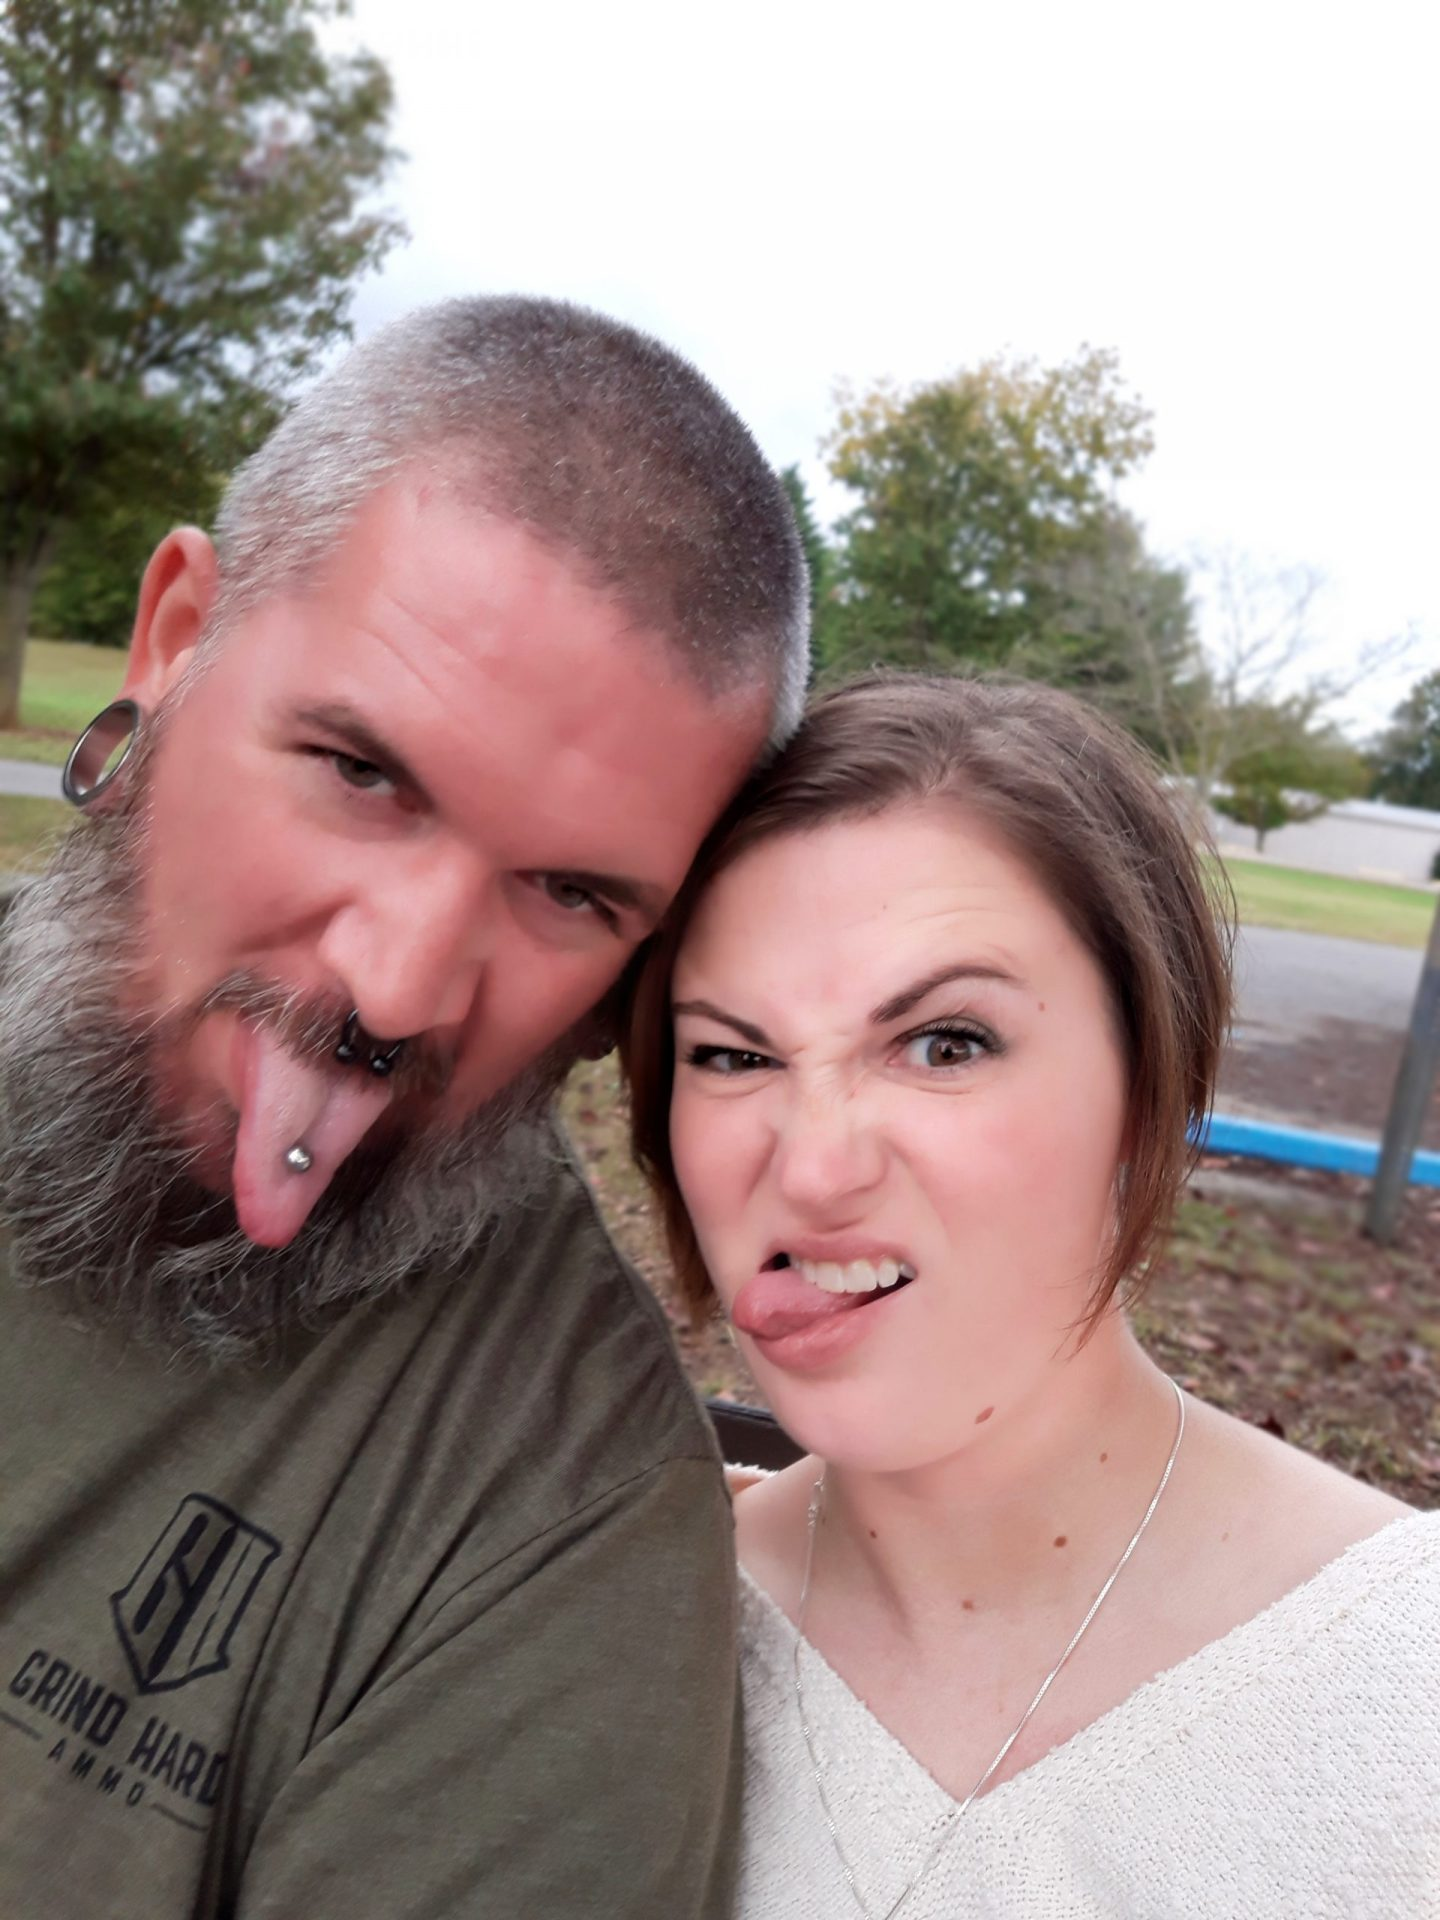 Nikki and Davis